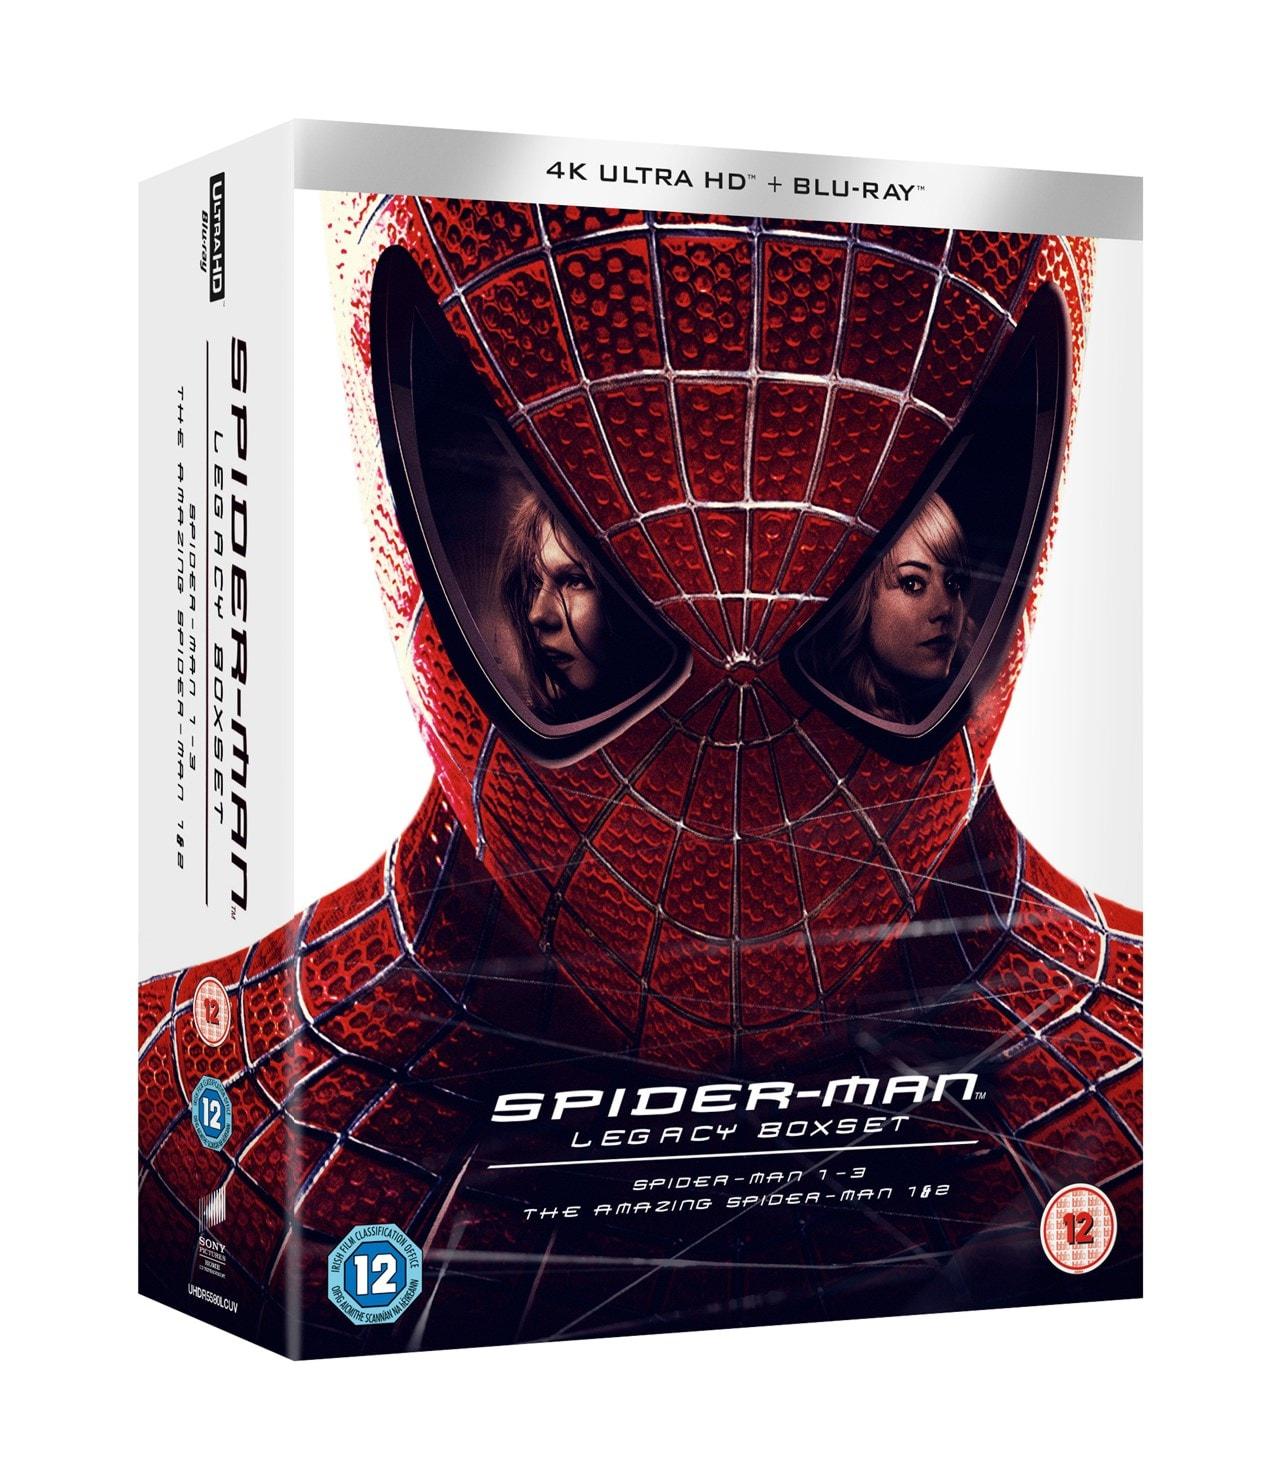 Spider-man Legacy - 3